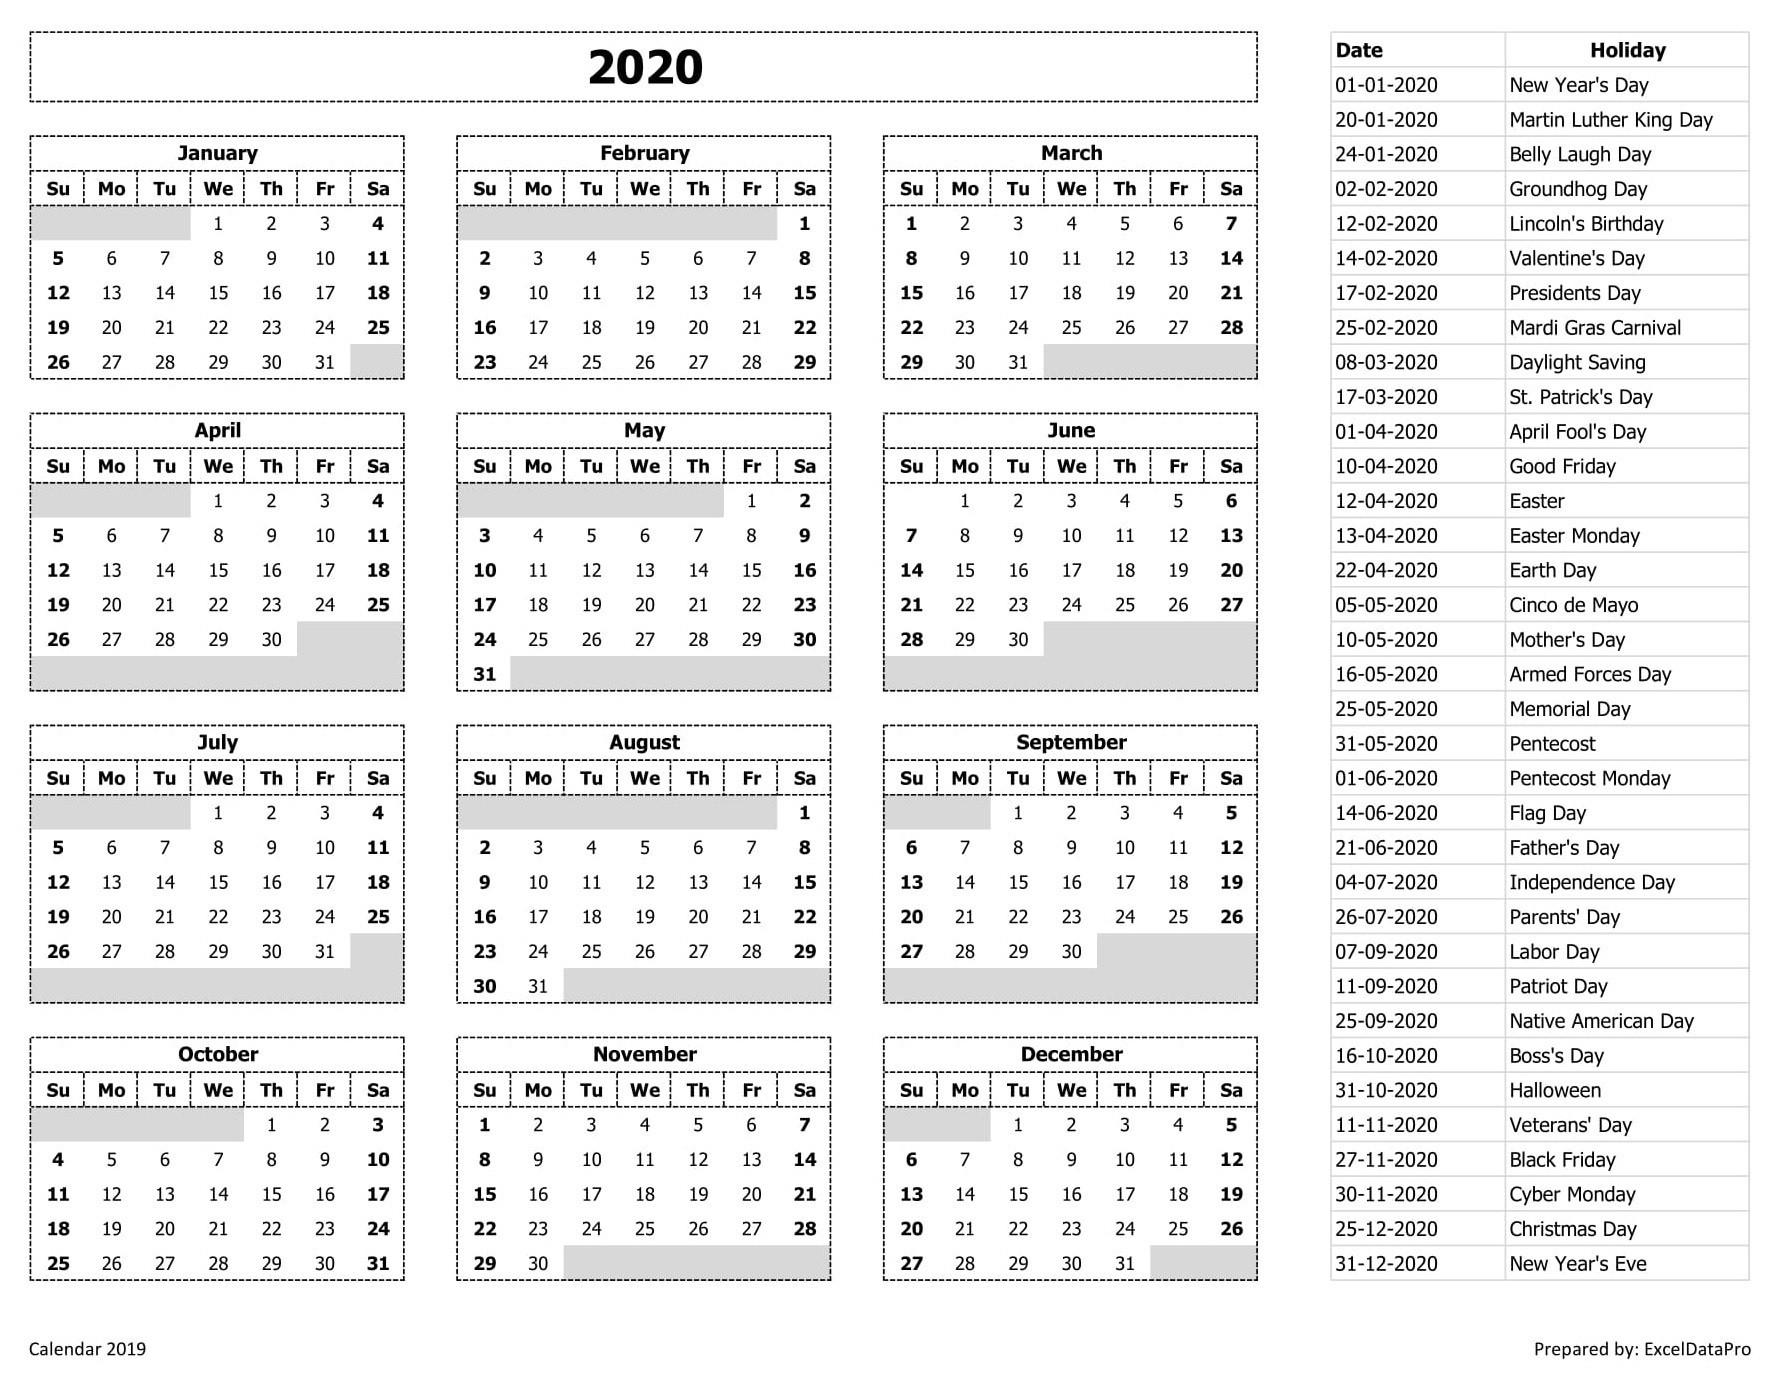 Uae Holidays 2020 Calendar | Calendar Template Printable-School Year Calendar 2020-20 Template